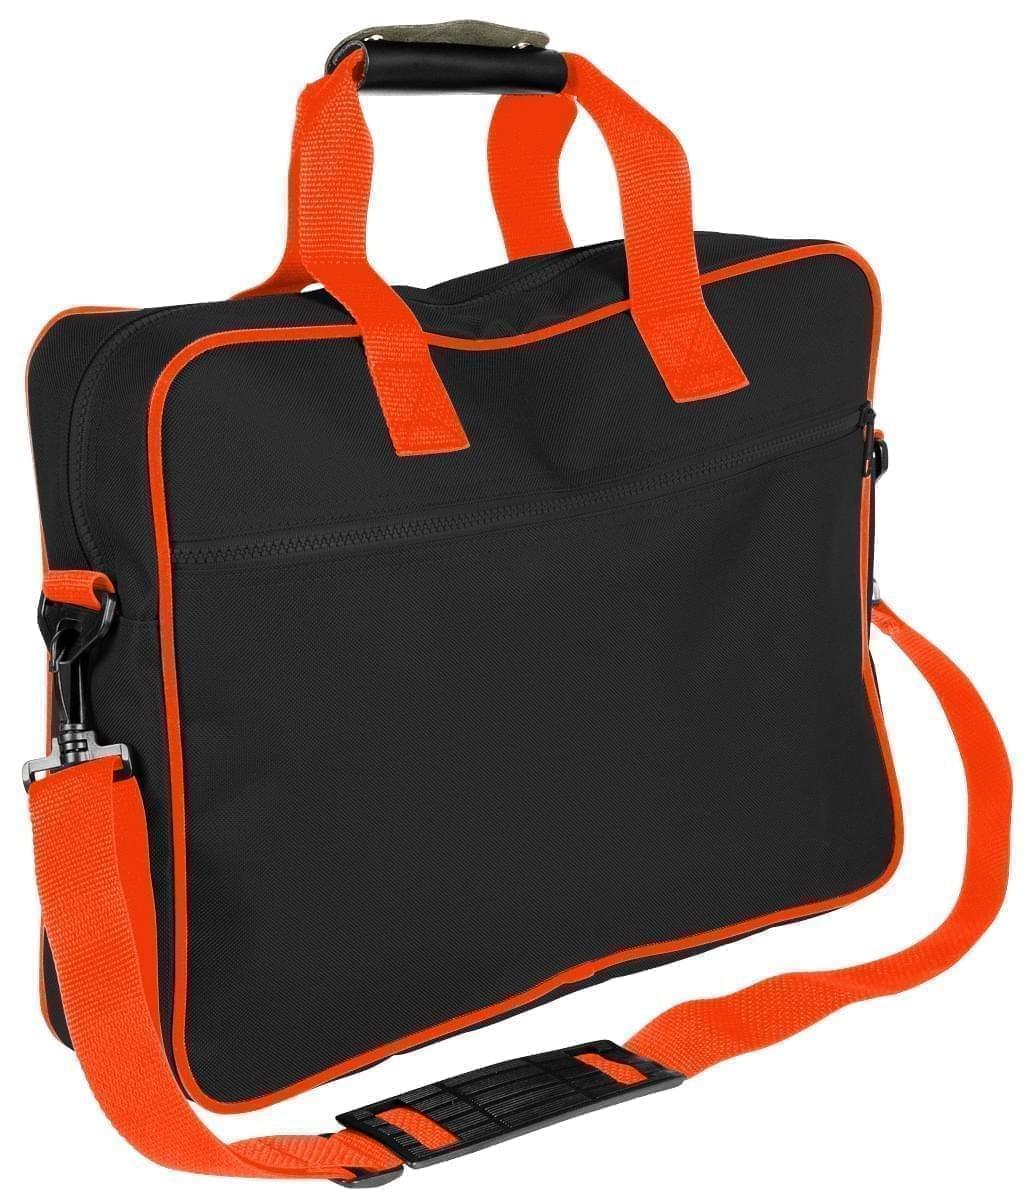 USA Made Nylon Poly Notebook Sleeves, Black-Orange, CPKVA59PO0